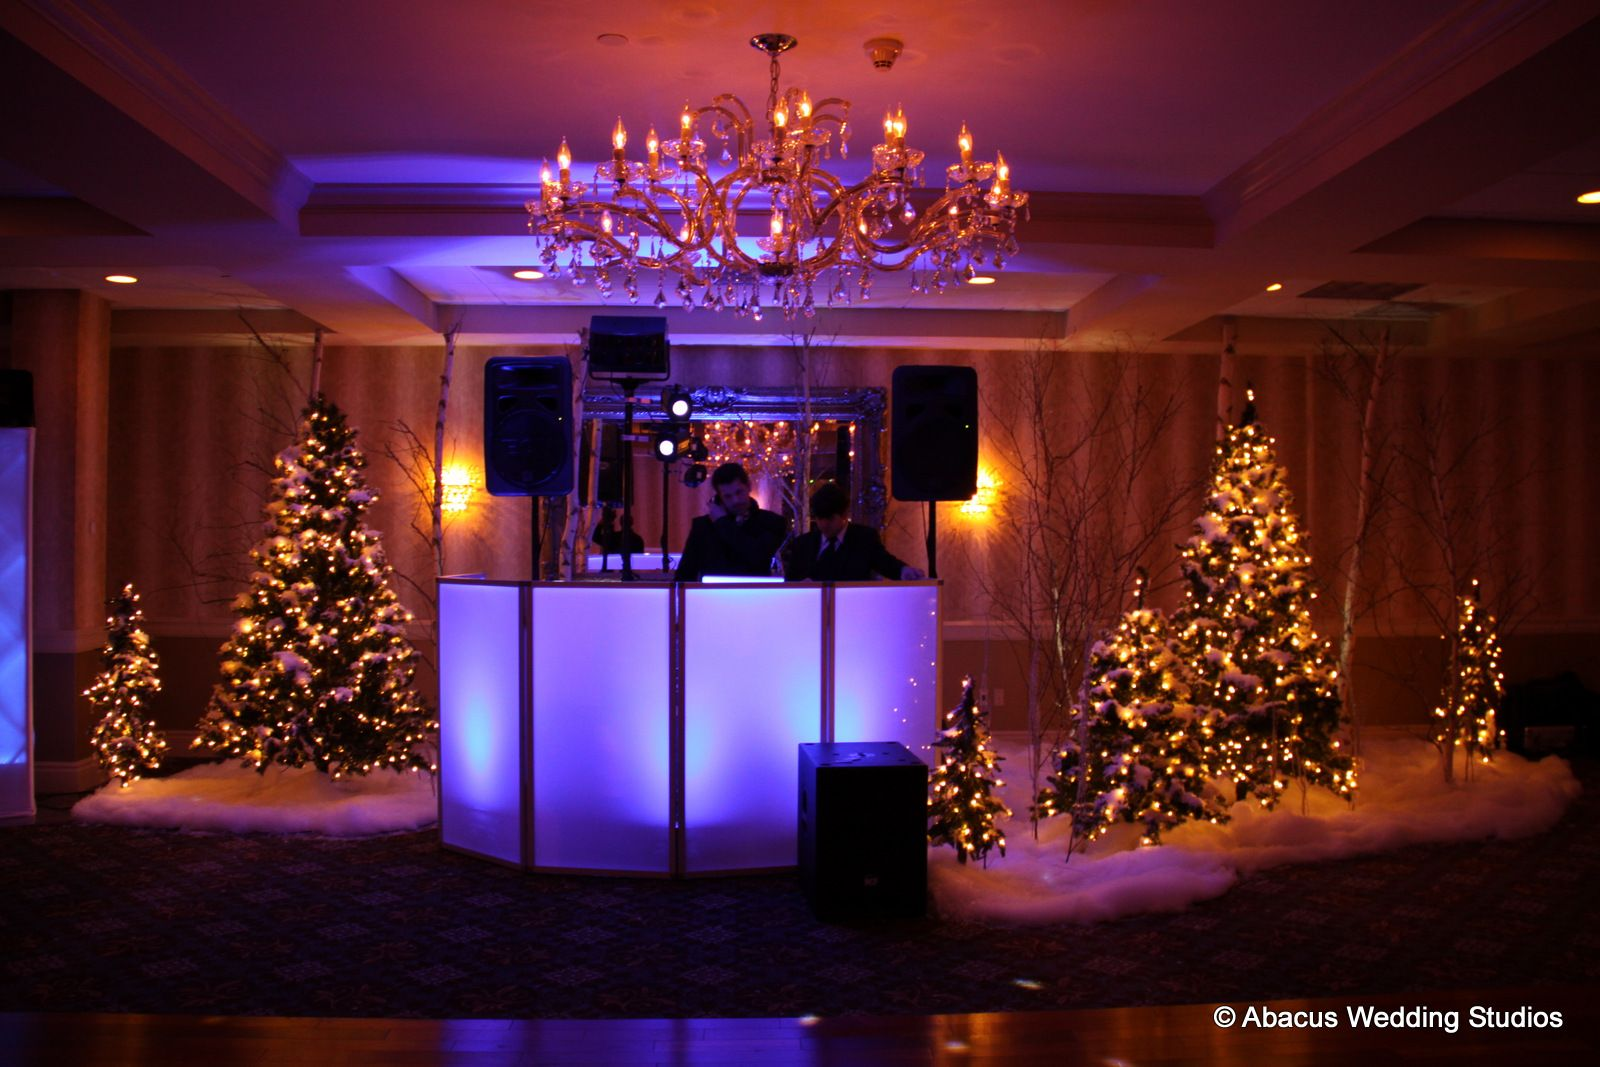 Winter Wonderland Themed Wedding Held At The Sterling Ballroom In